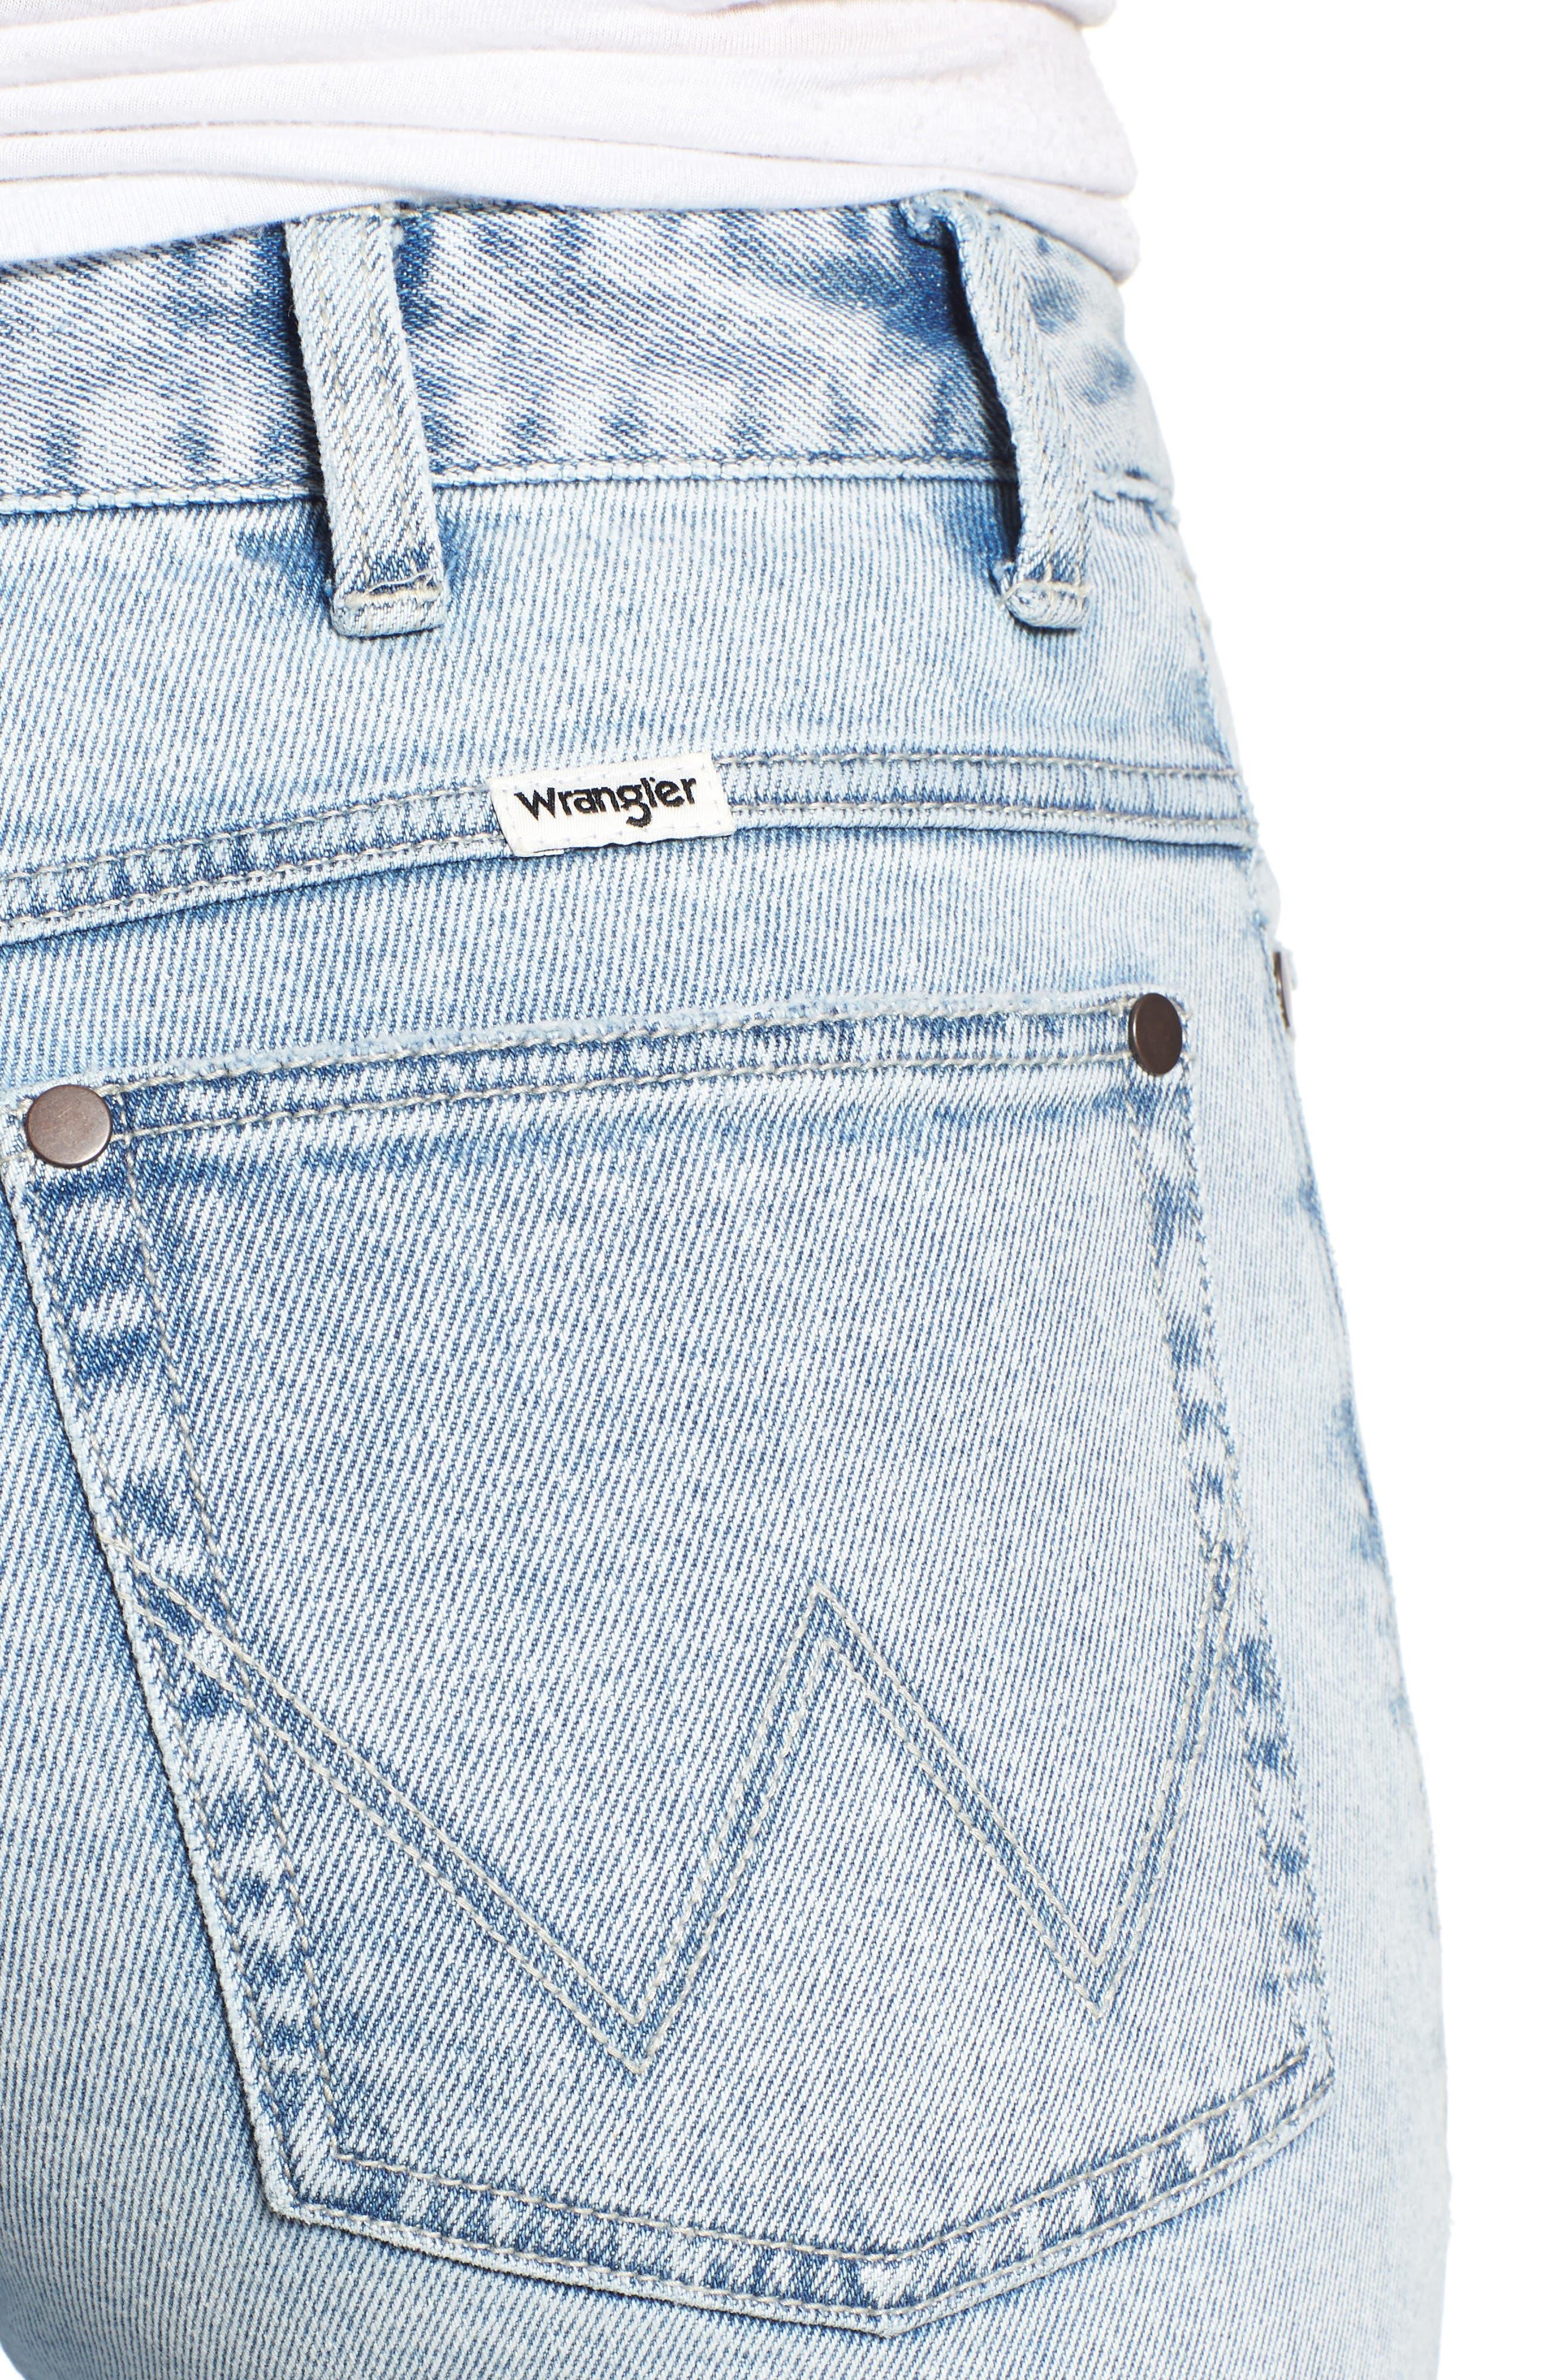 WRANGLER,                             Acid Wash High Waist Crop Jeans,                             Alternate thumbnail 4, color,                             454